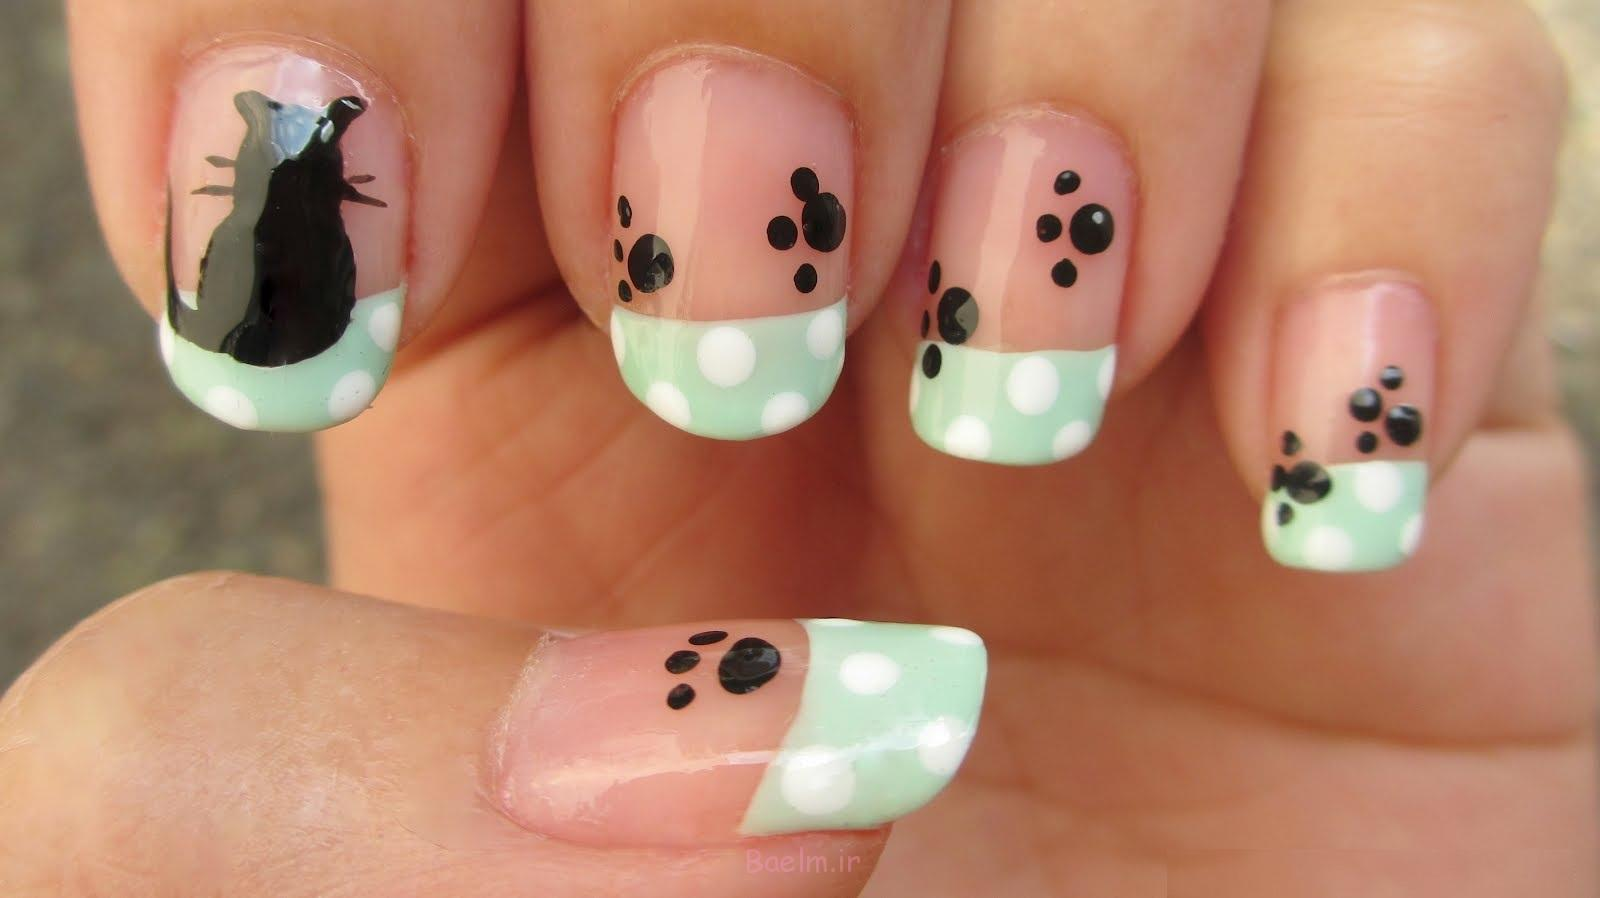 http://trendymods.com/wp-content/uploads/2014/10/great-animal-nail-art.jpg